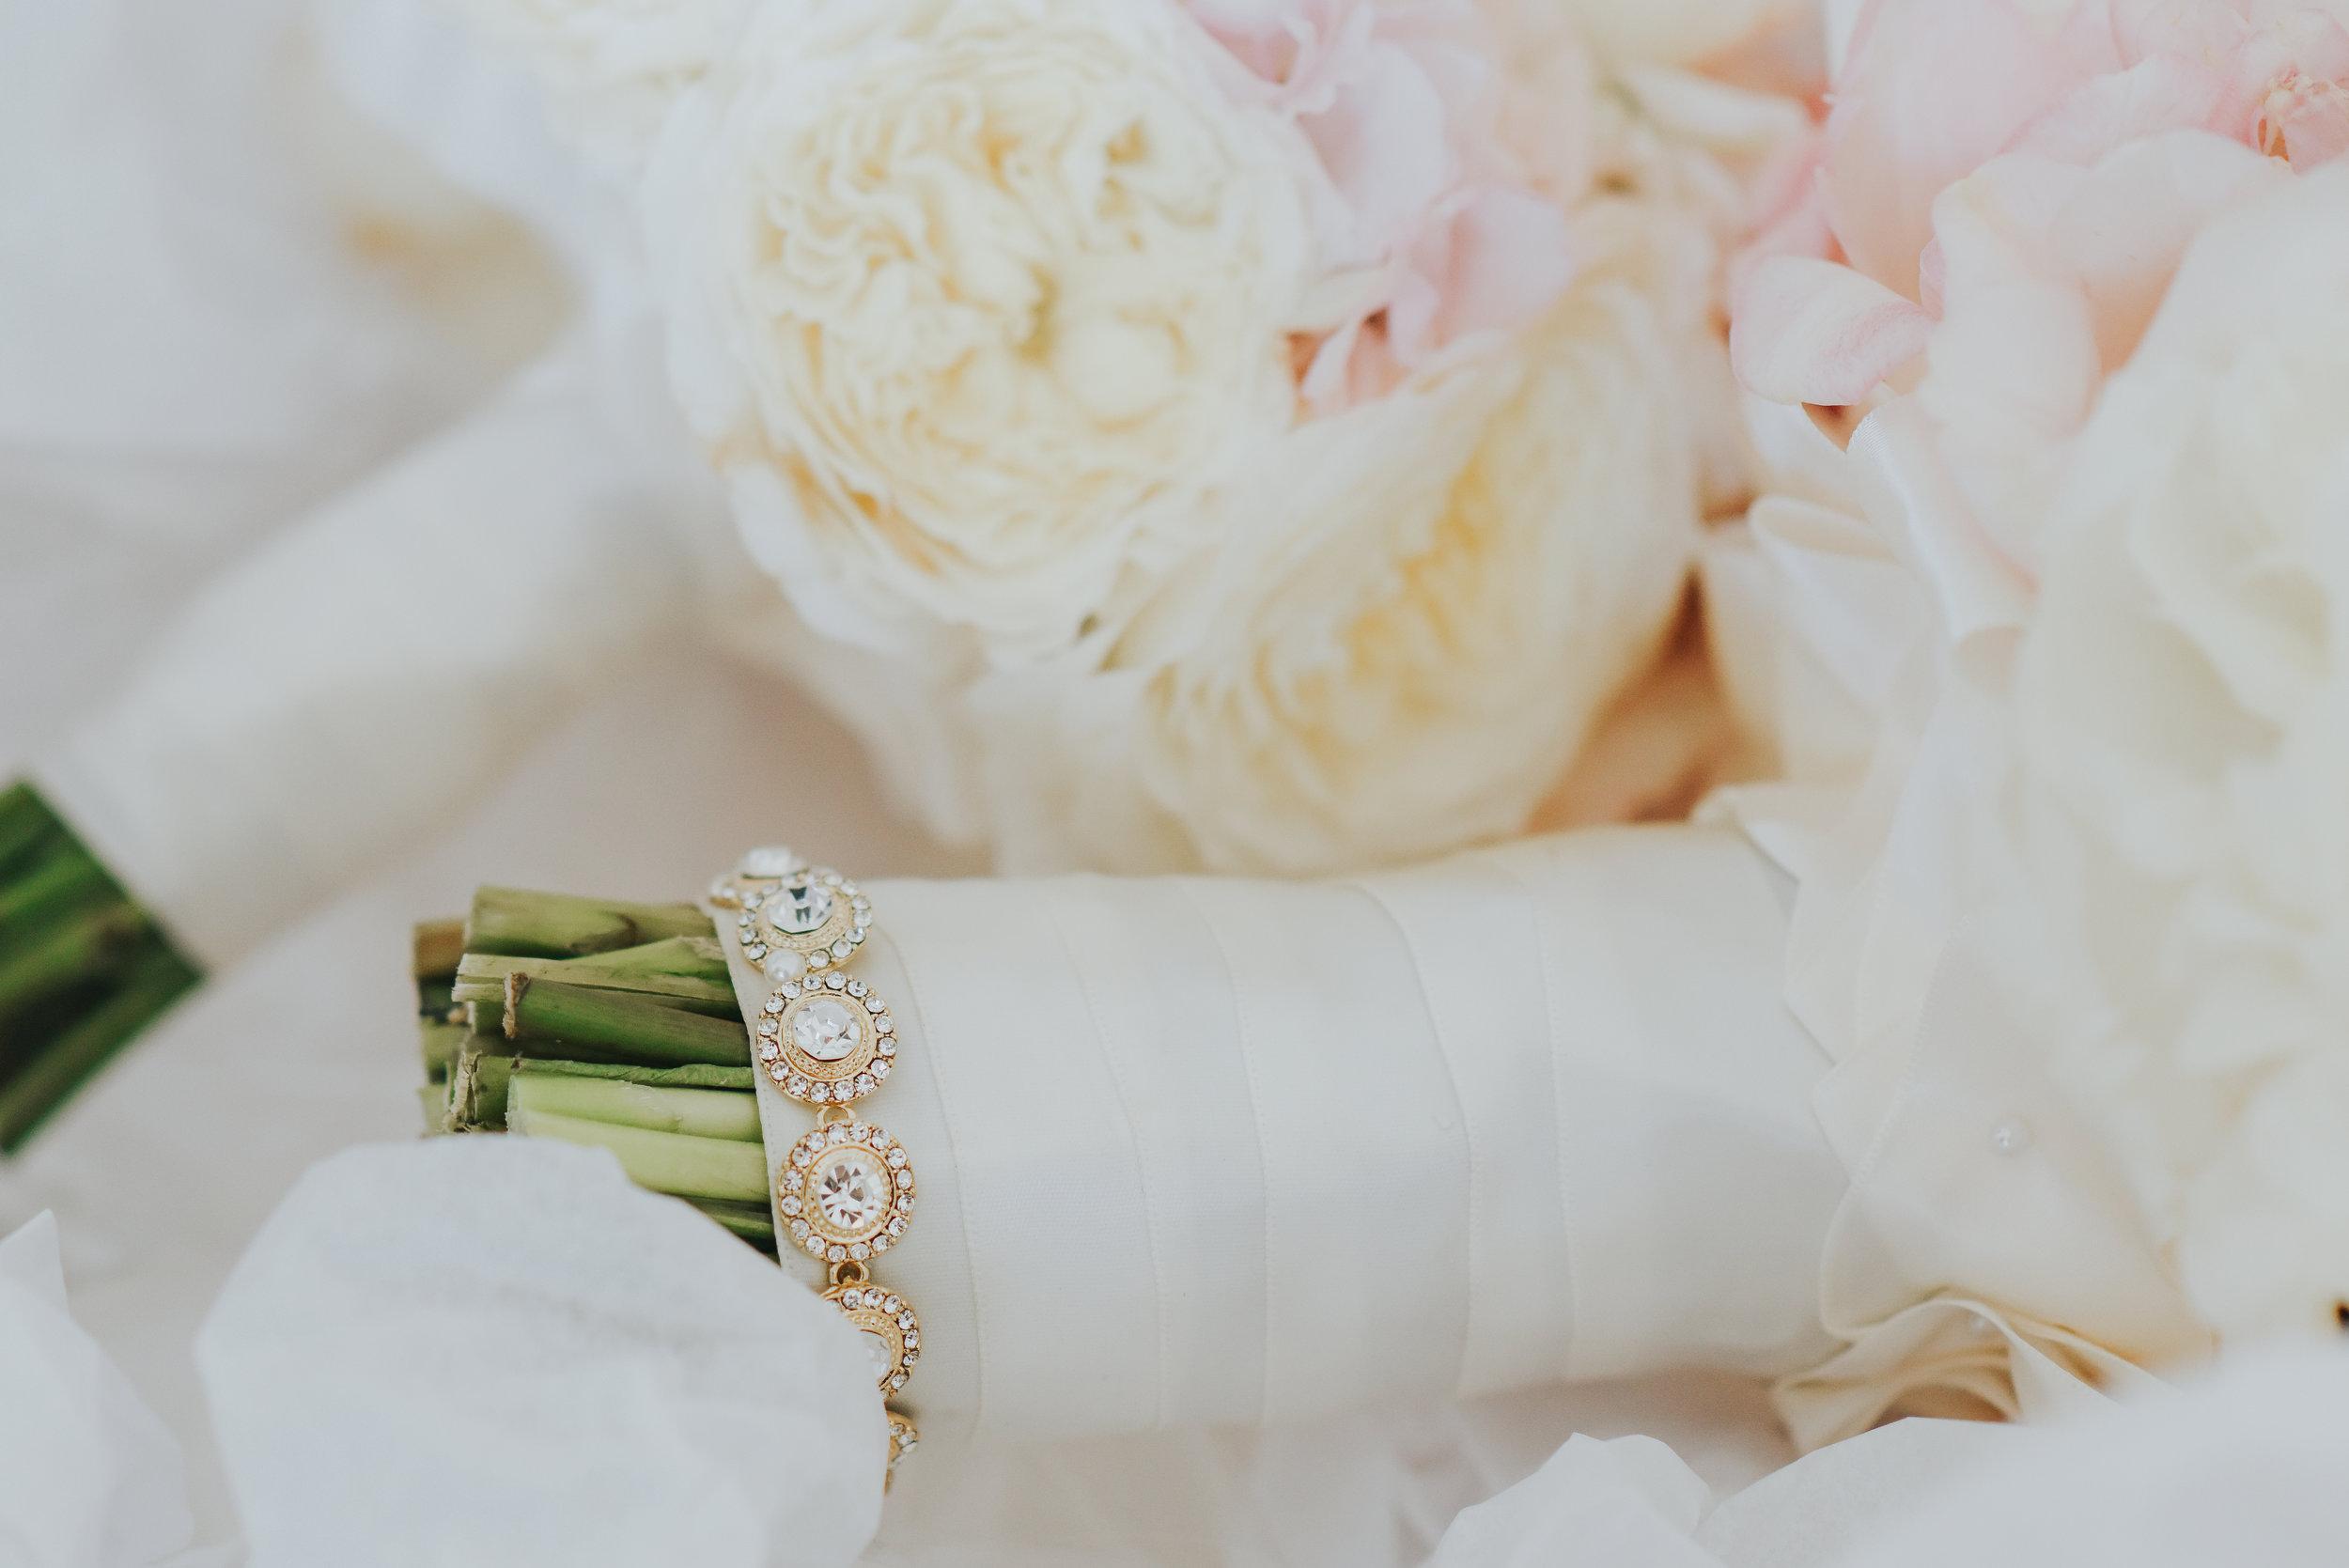 Idena Beach Photography : Vermont Luxury Wedding Photographer, New England Luxury Wedding Photographer, New York Luxury Wedding Photographer